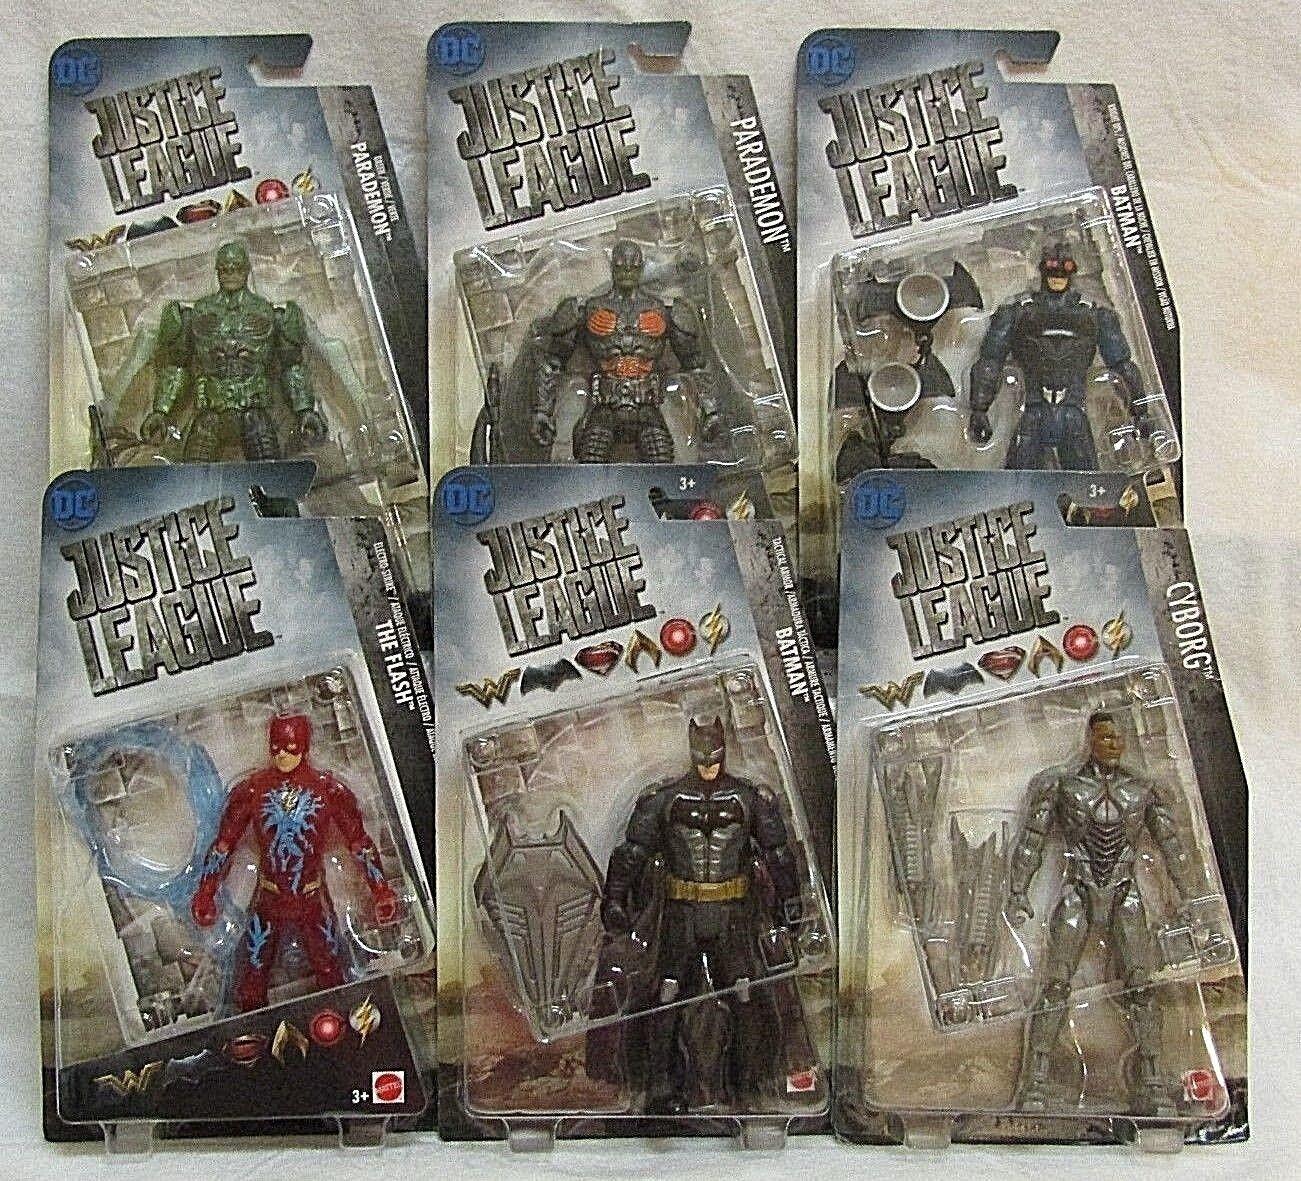 DC JUSTICE LEAGUE azione cifra Set Batuomo, Flash, Cyborg, parademoni Set di 6